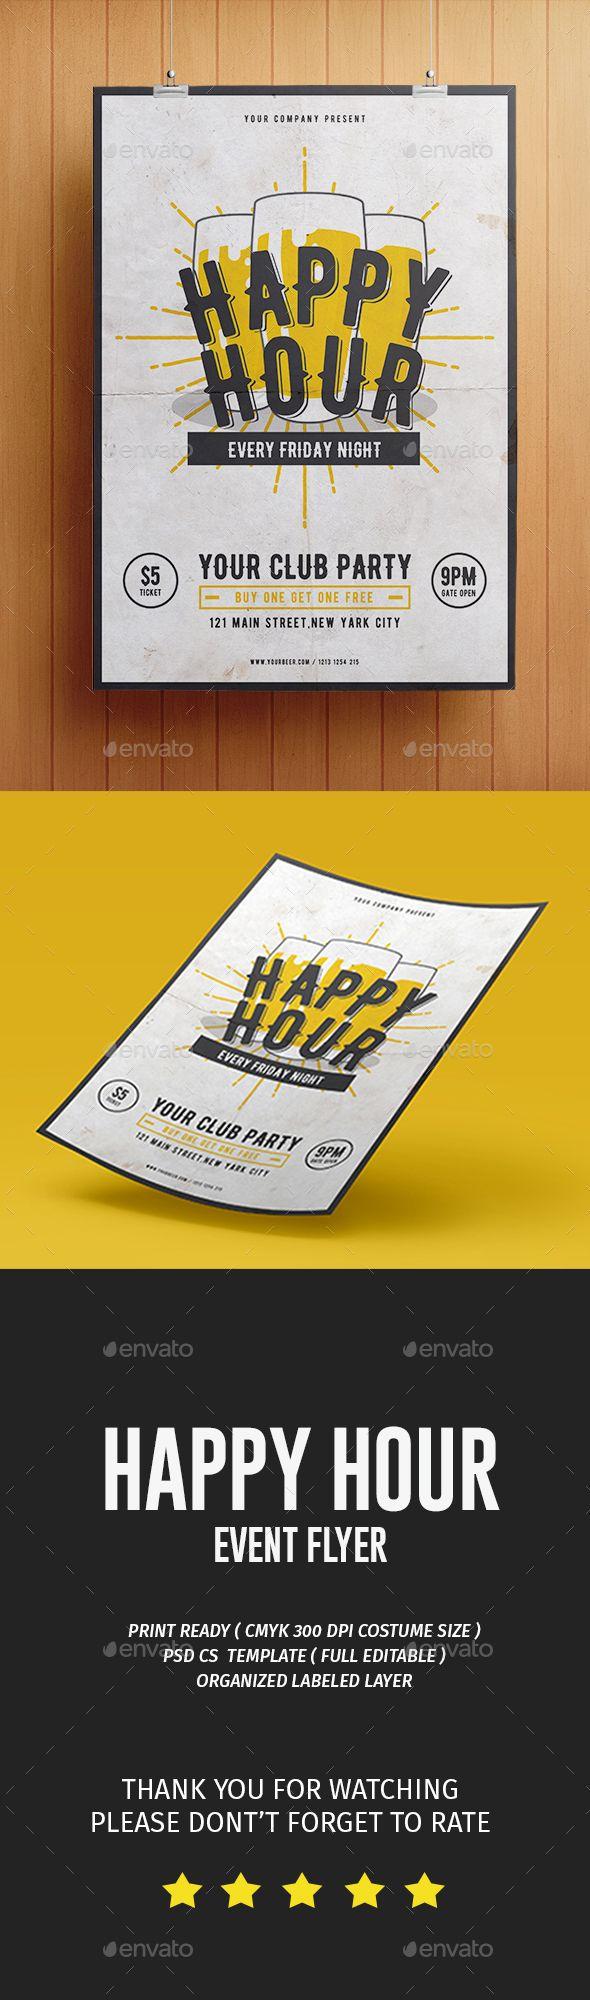 Happy Hour Flyer Template PSD. Download here: https://graphicriver.net/item/happy-hour-flyer/17278604?ref=ksioks